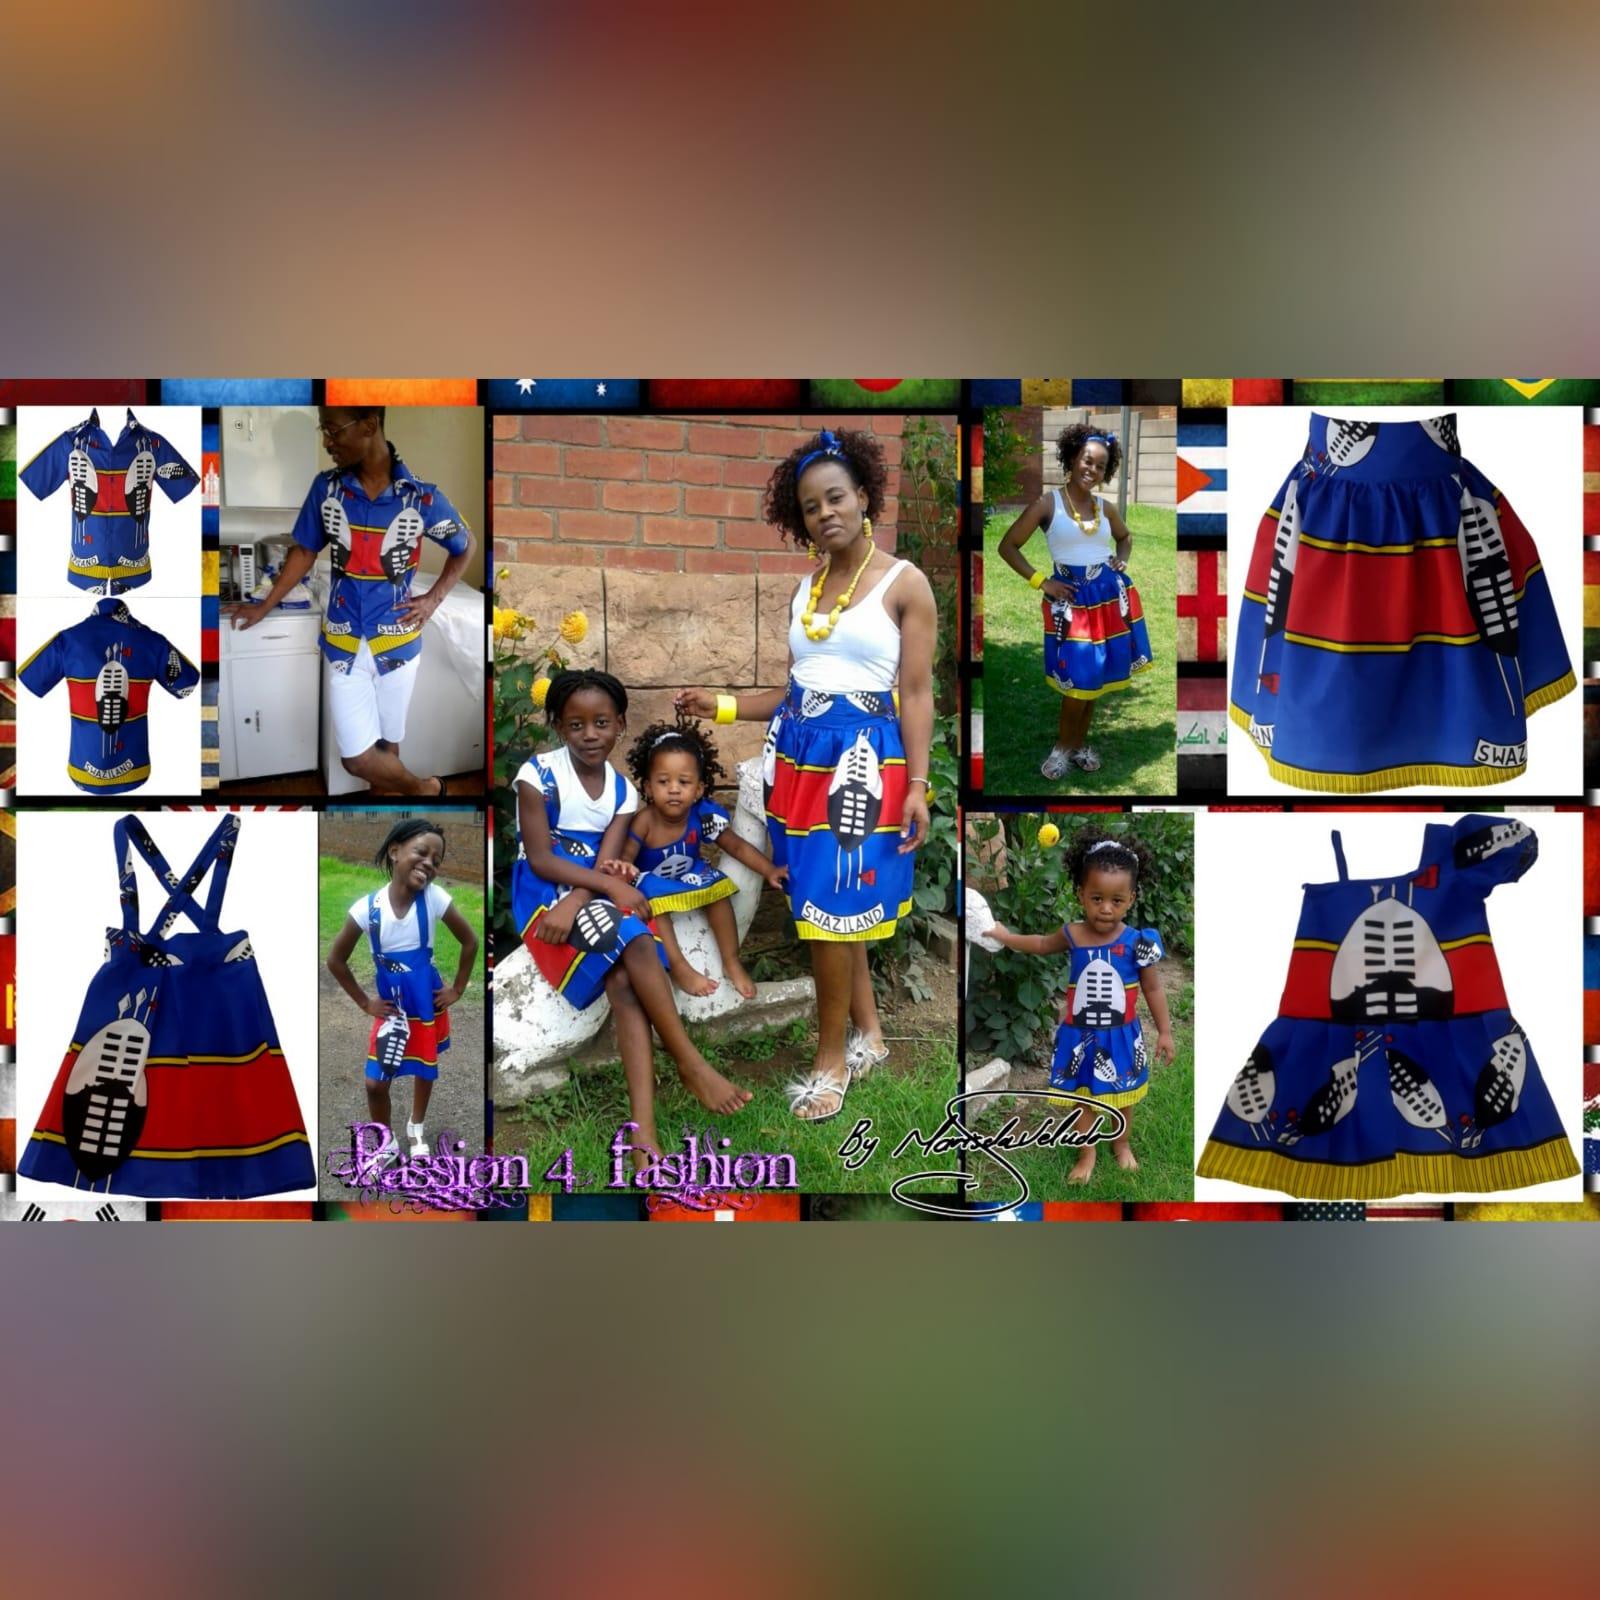 Swati traditional wedding attire 3 mens swazi/swati short sleeve shirt. High waisted swazi/swati skirt. High waisted pleated swazi/swati skirt with crossed shoulder straps. One sleeve little girls swazi/swati dress with shoulder strap. Traditional wedding attire